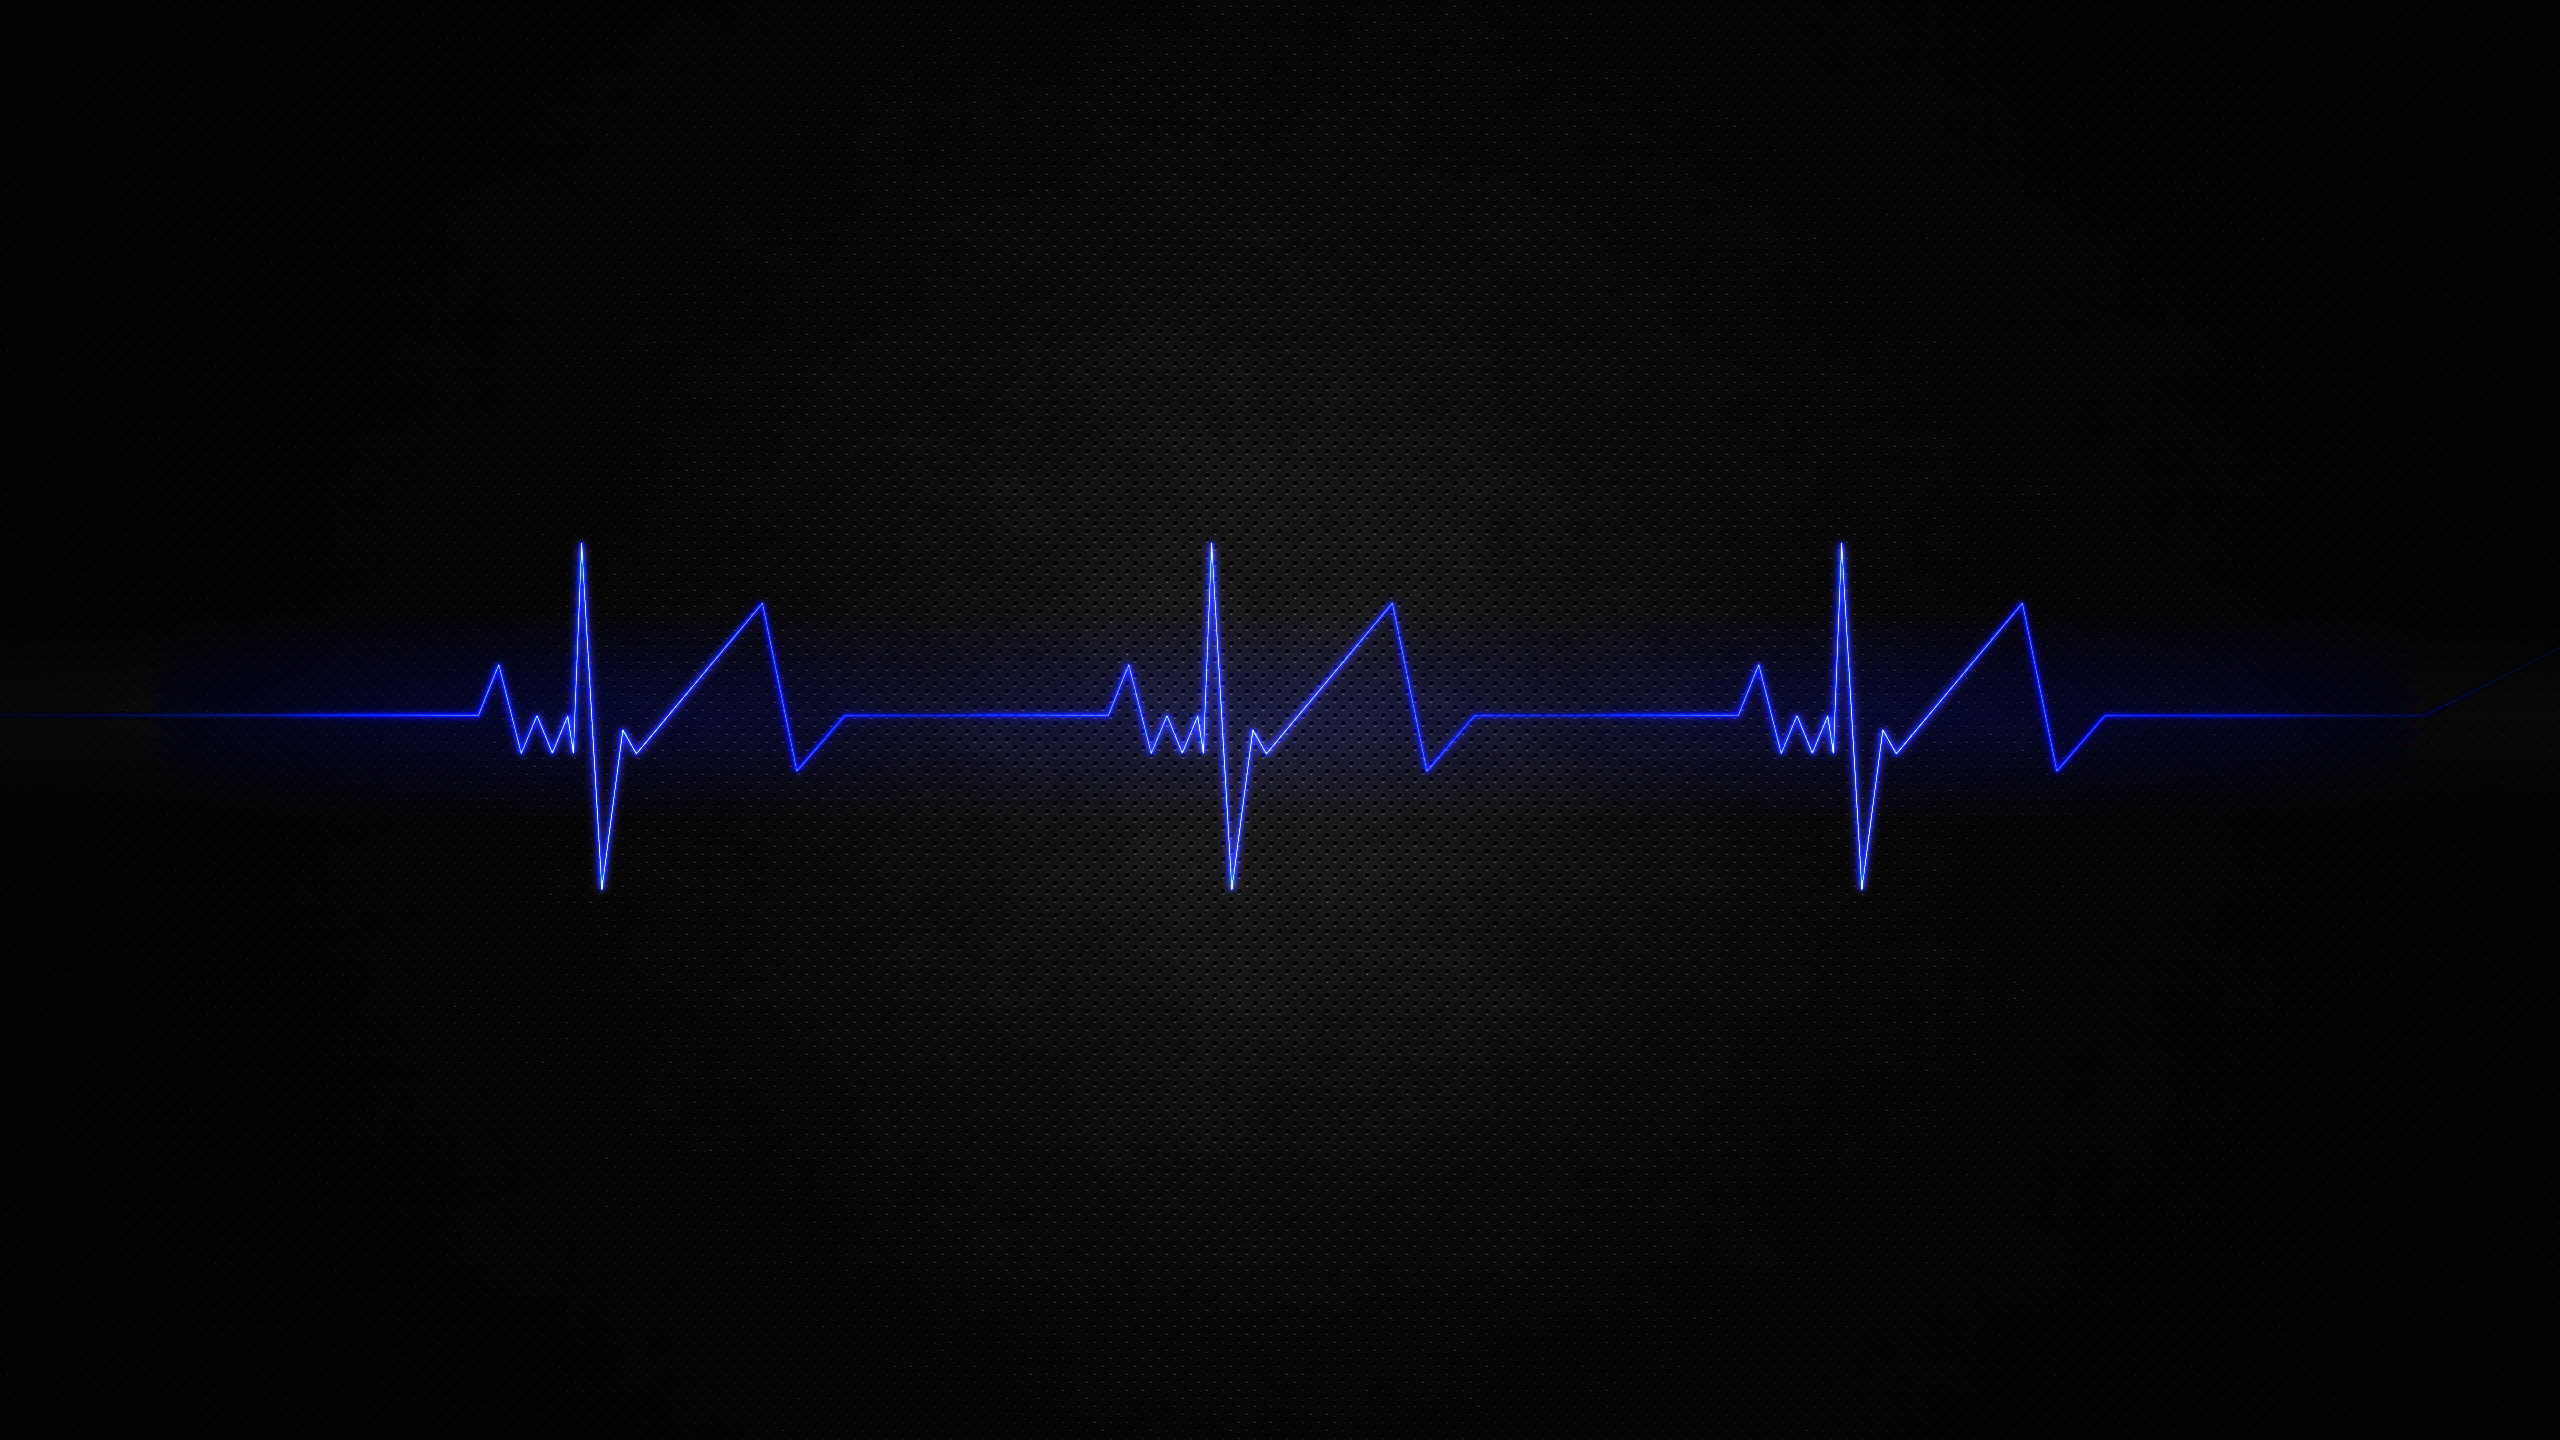 heartbeat wallpaper wallpapersafari